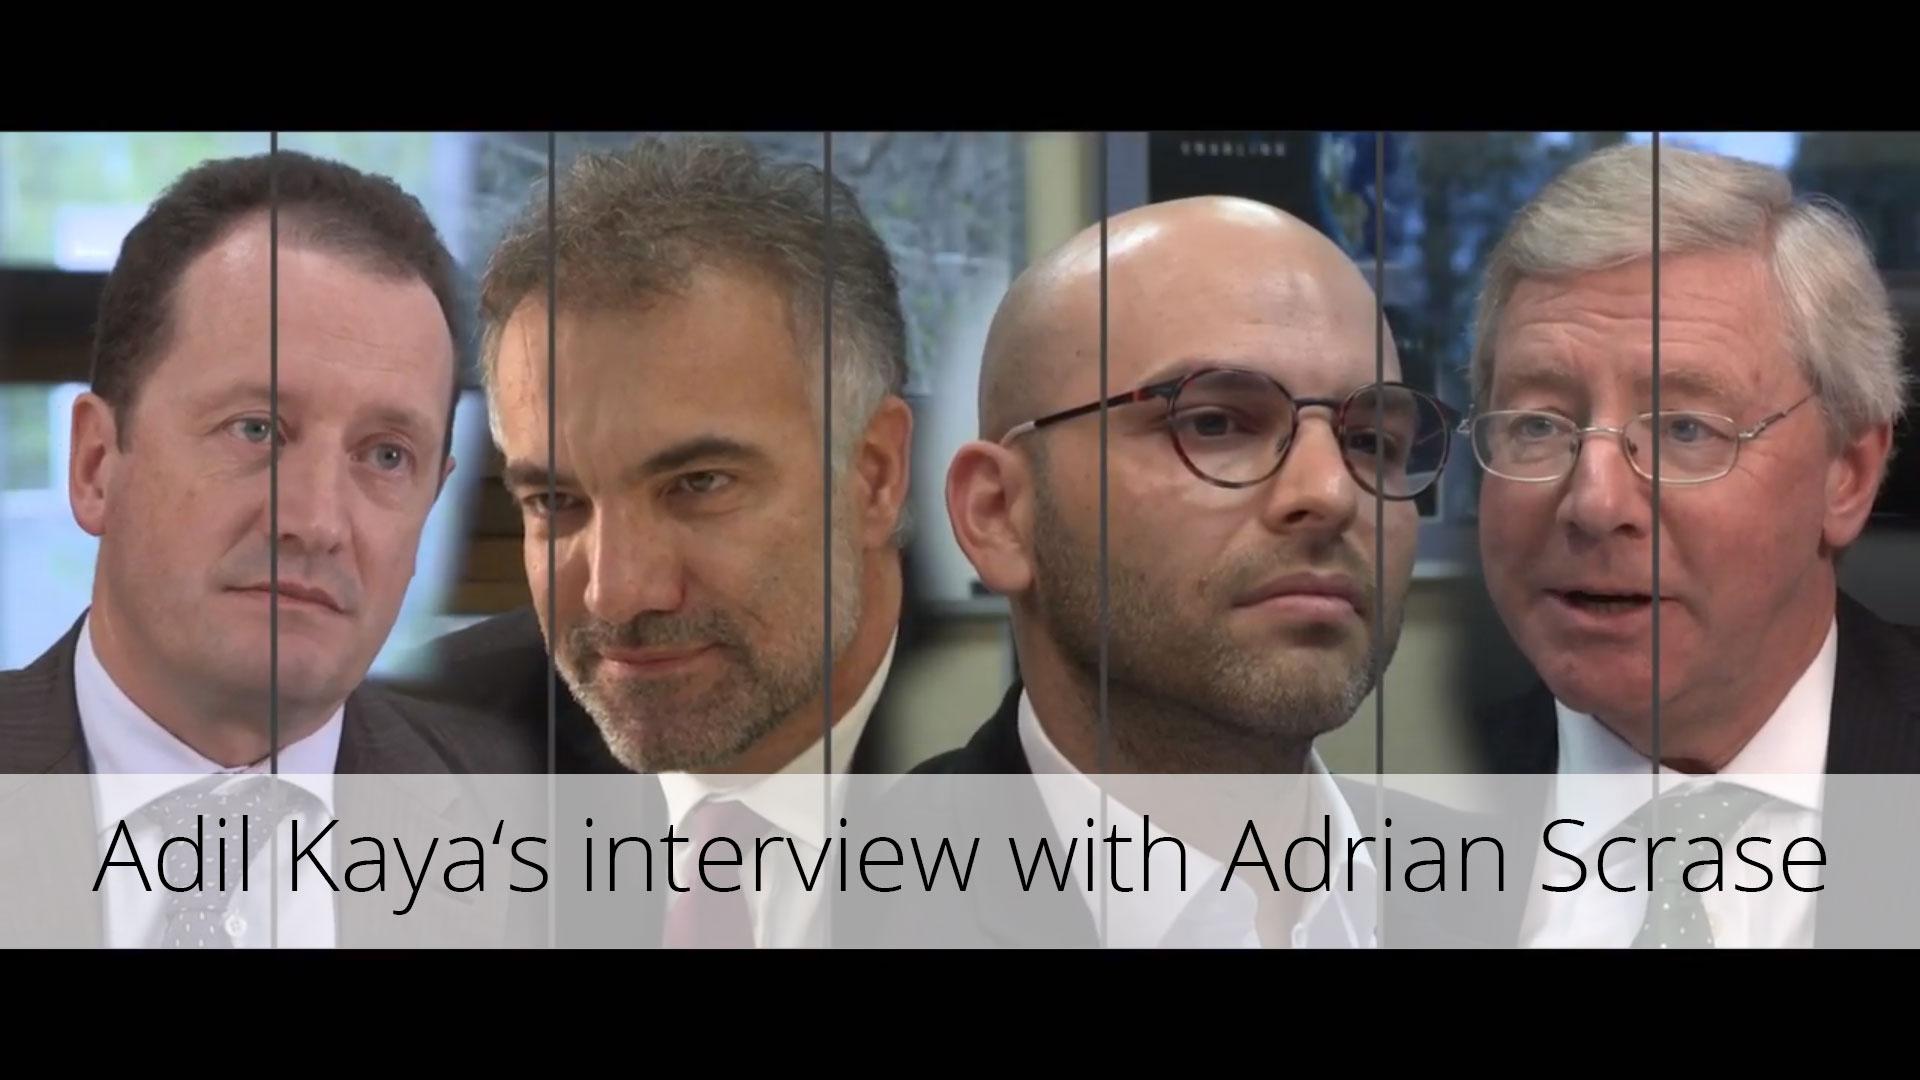 Adil Kaya interwiew with Adrias Scrase, ETSI, 5GPP